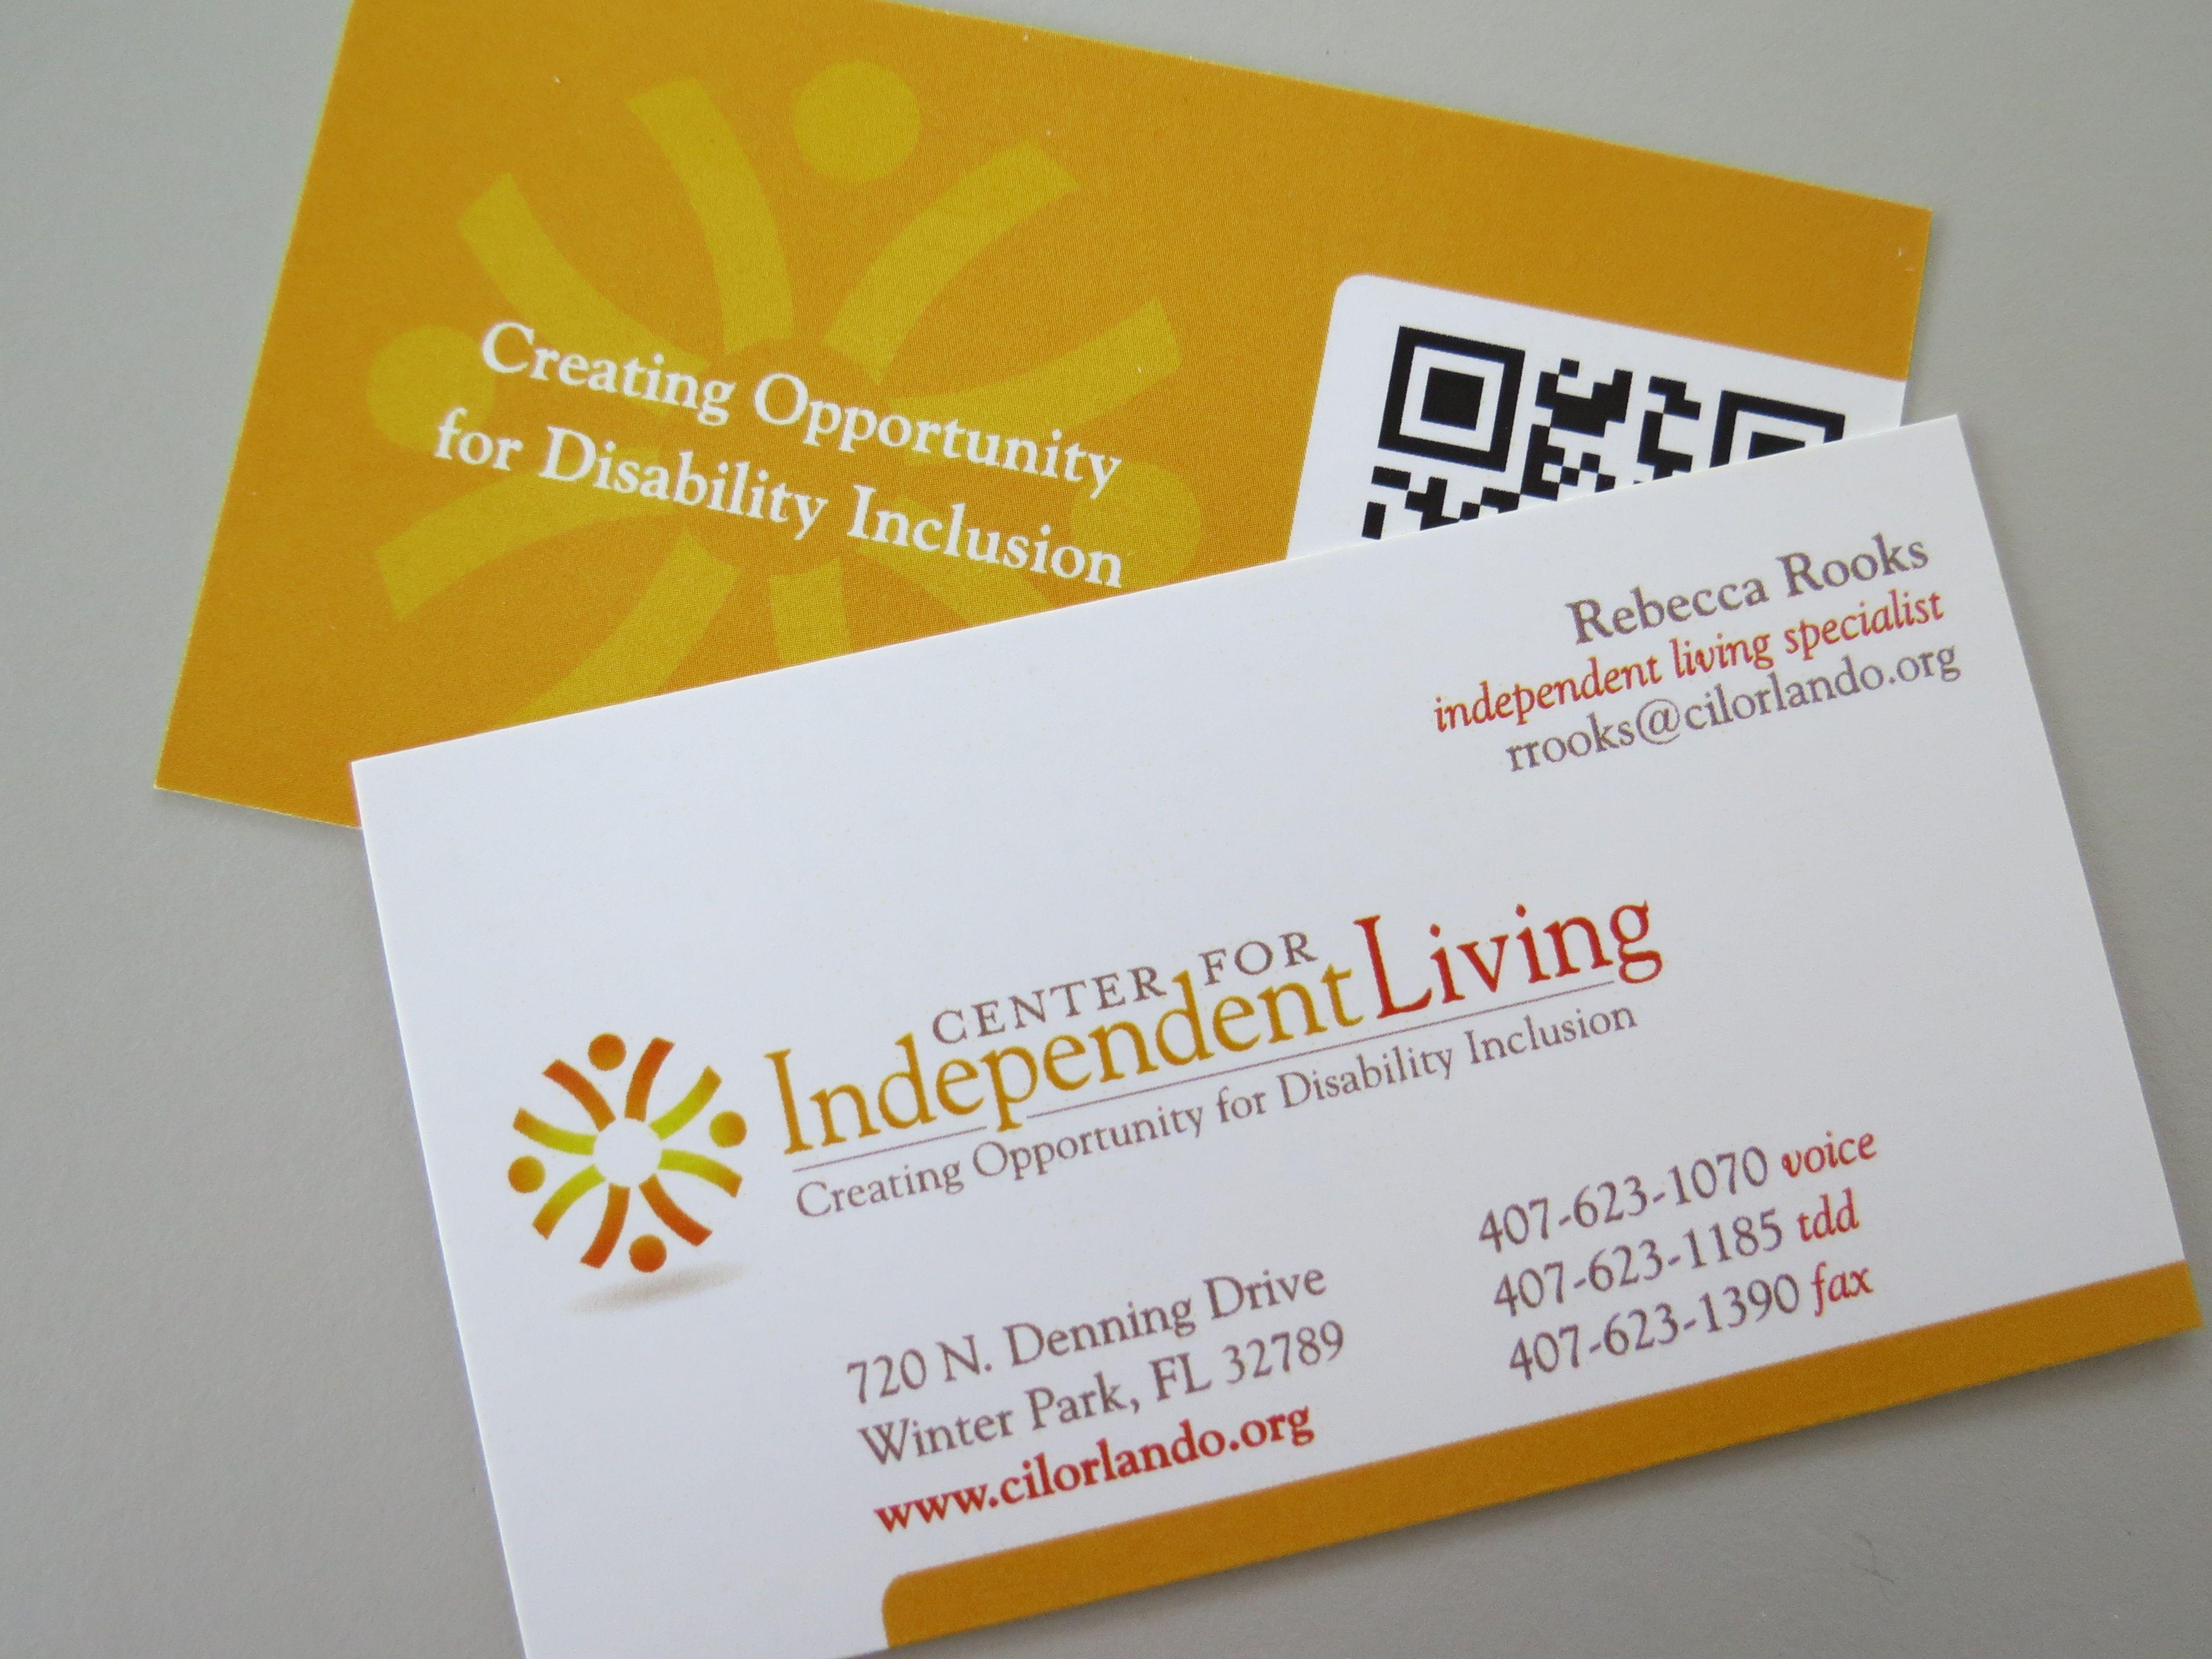 Business Cards 2 Sided Digital Printed Gloss Cover Bleeds Qr Code Www Winterpark Minutemanpress Com Business Cards Cards Digital Prints